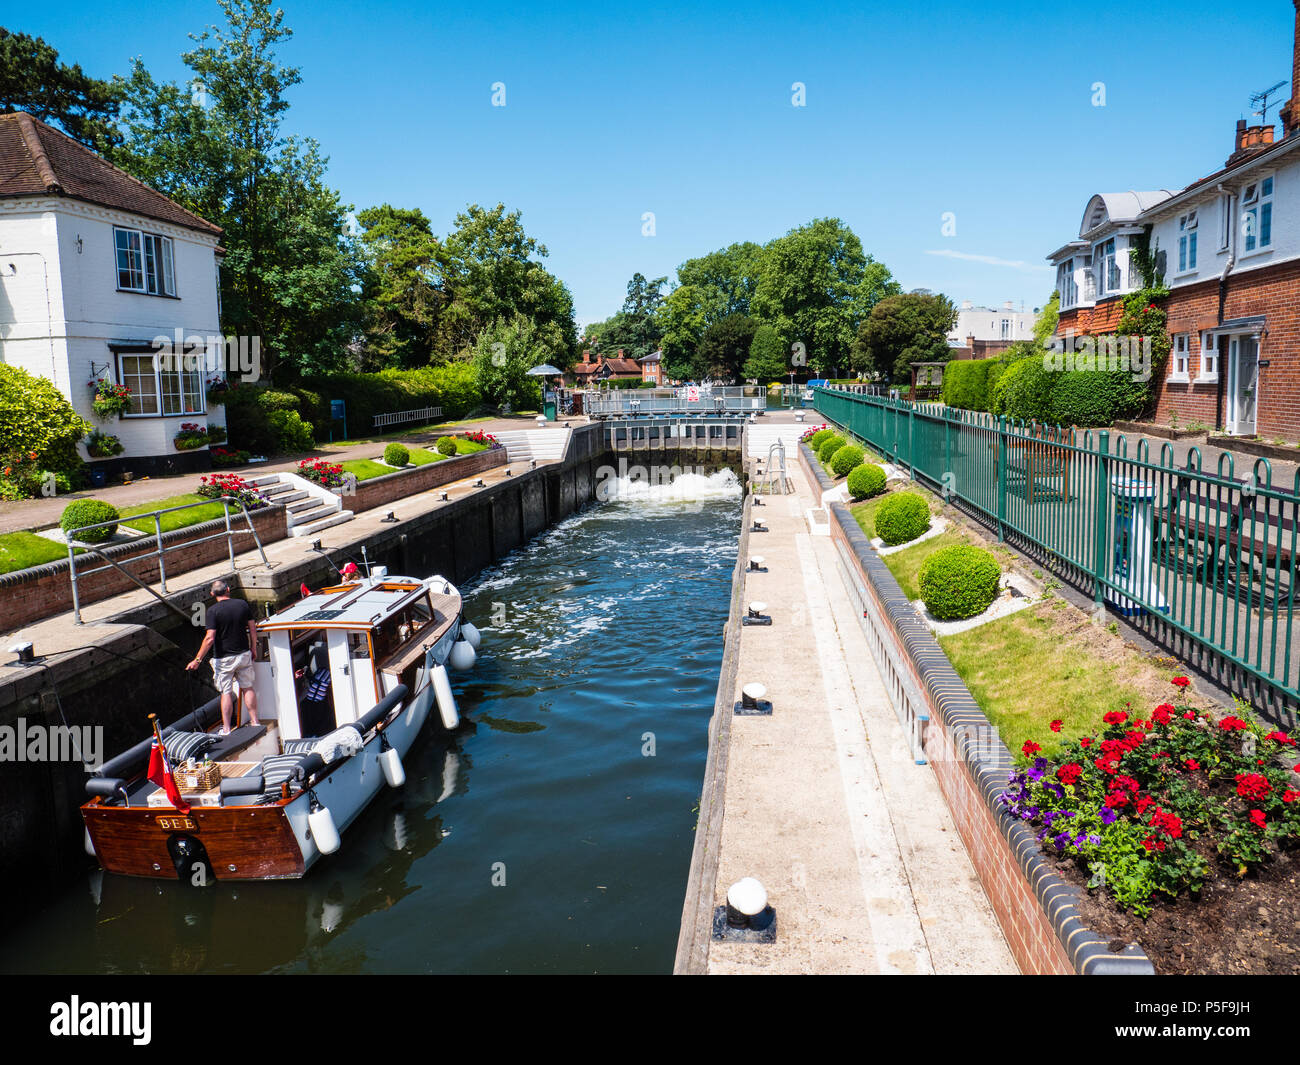 Barco pasando arrojaron, bloqueo de Marlow, el Río Támesis, en Marlow, Buckinghamshire, Inglaterra, Reino Unido, GB. Foto de stock